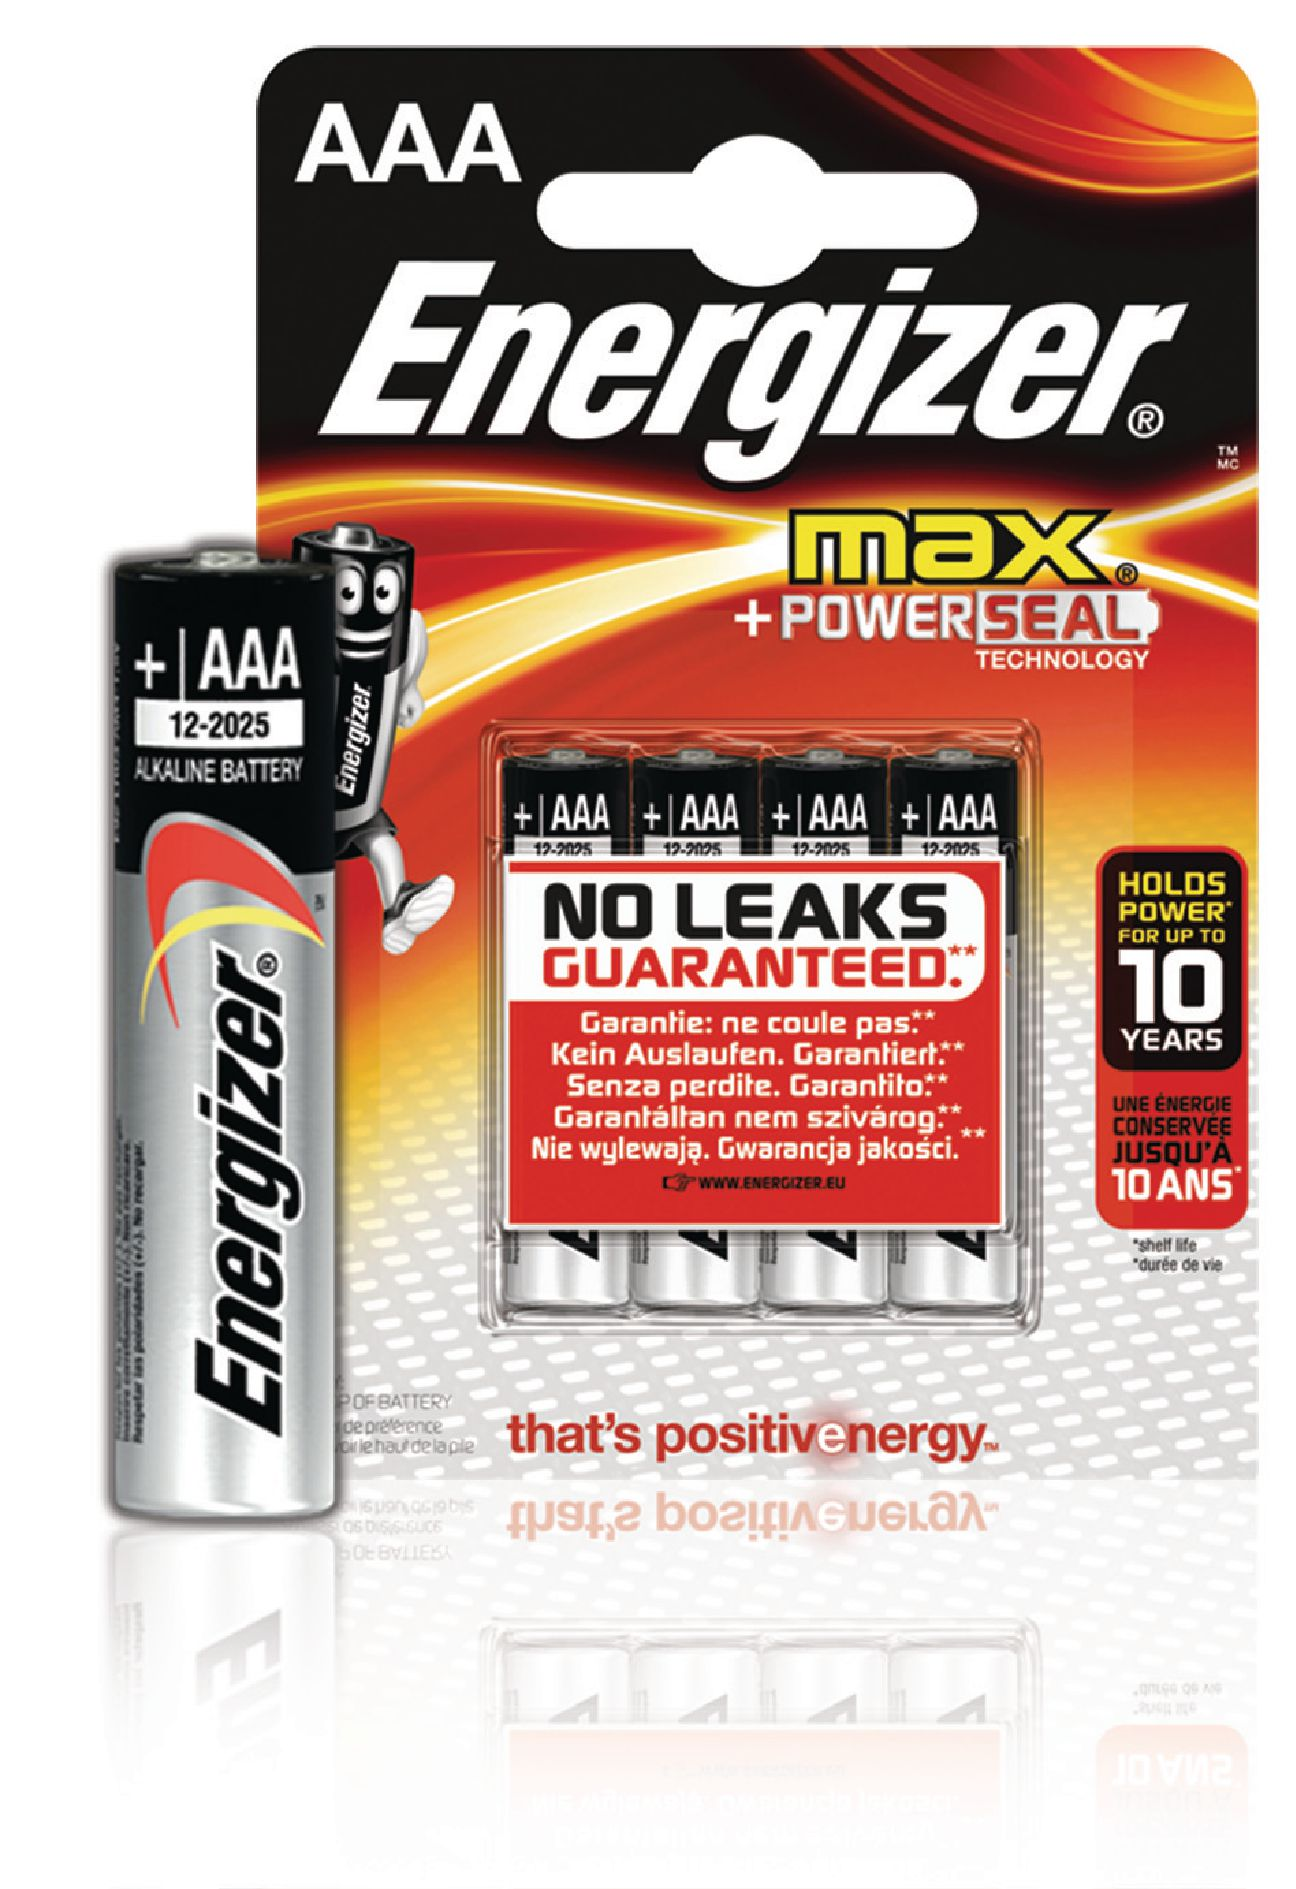 Alkalická baterie Energizer Max AAA 1.5V, 4ks, EN-E300124200